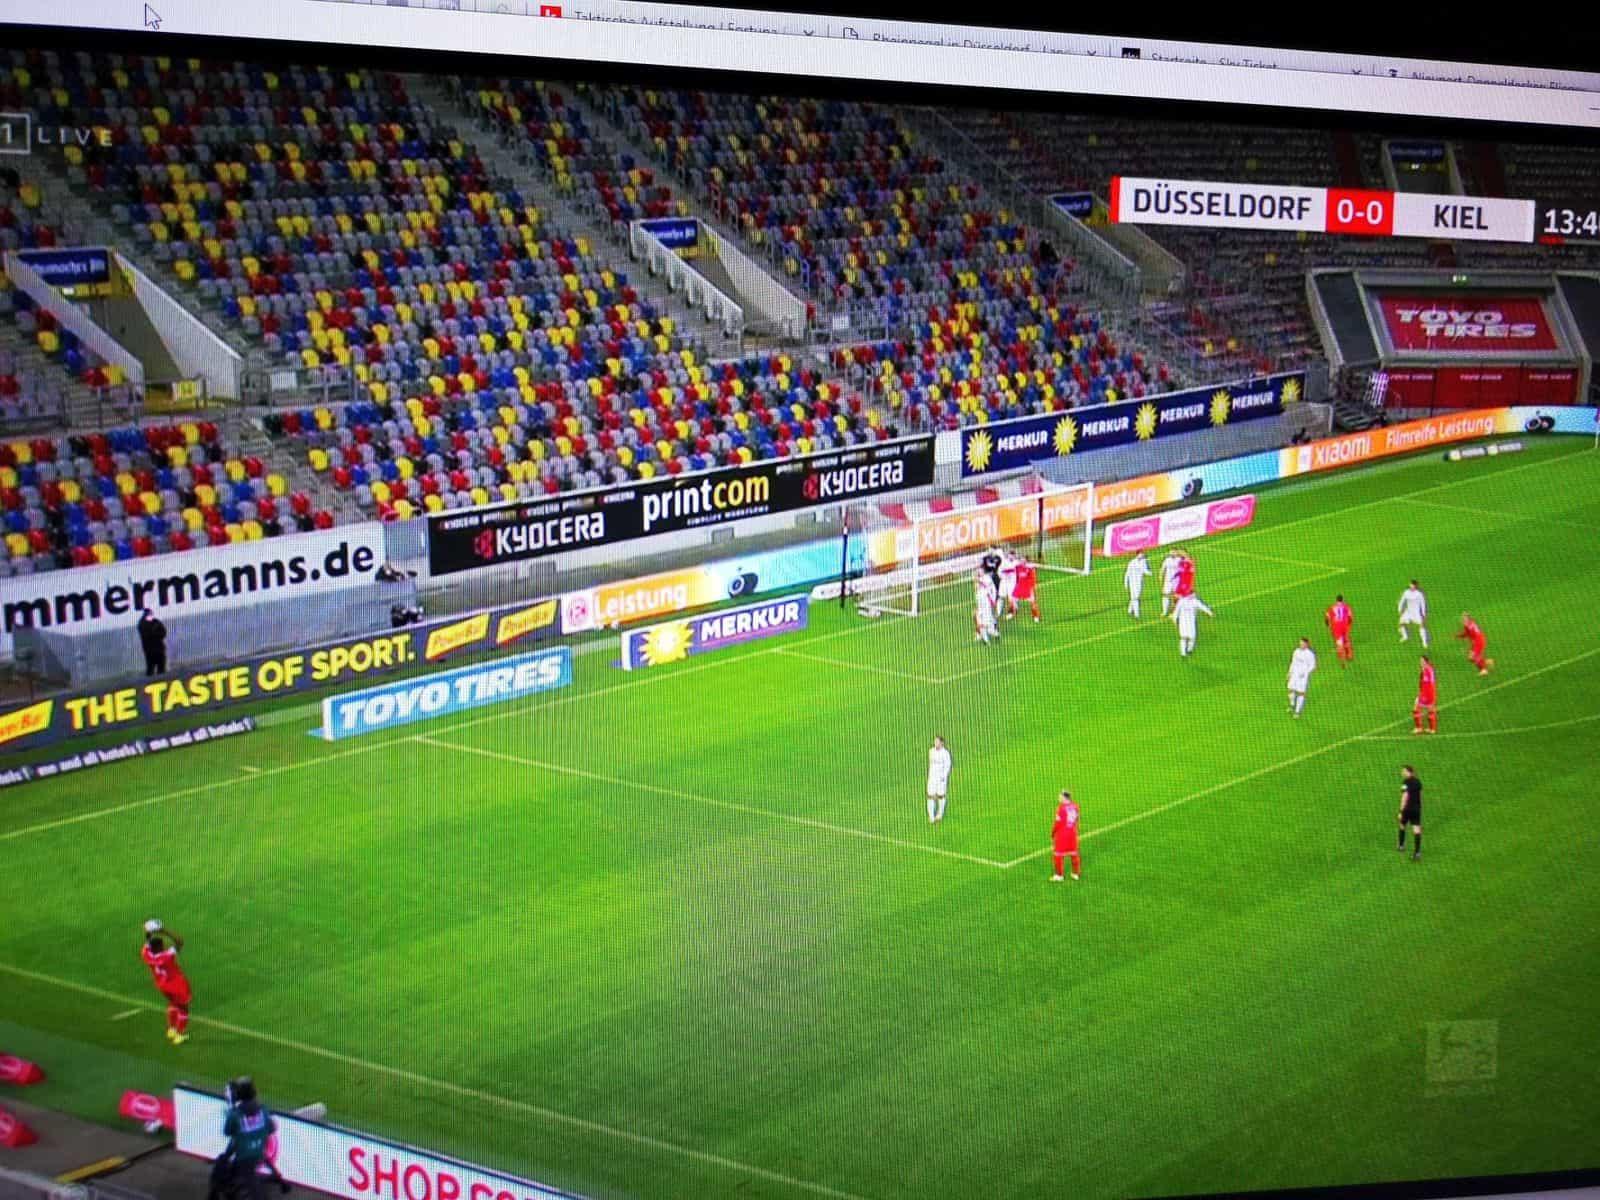 F95 vs Kiel: Danso - Einwürfe wie von Harald Katemann